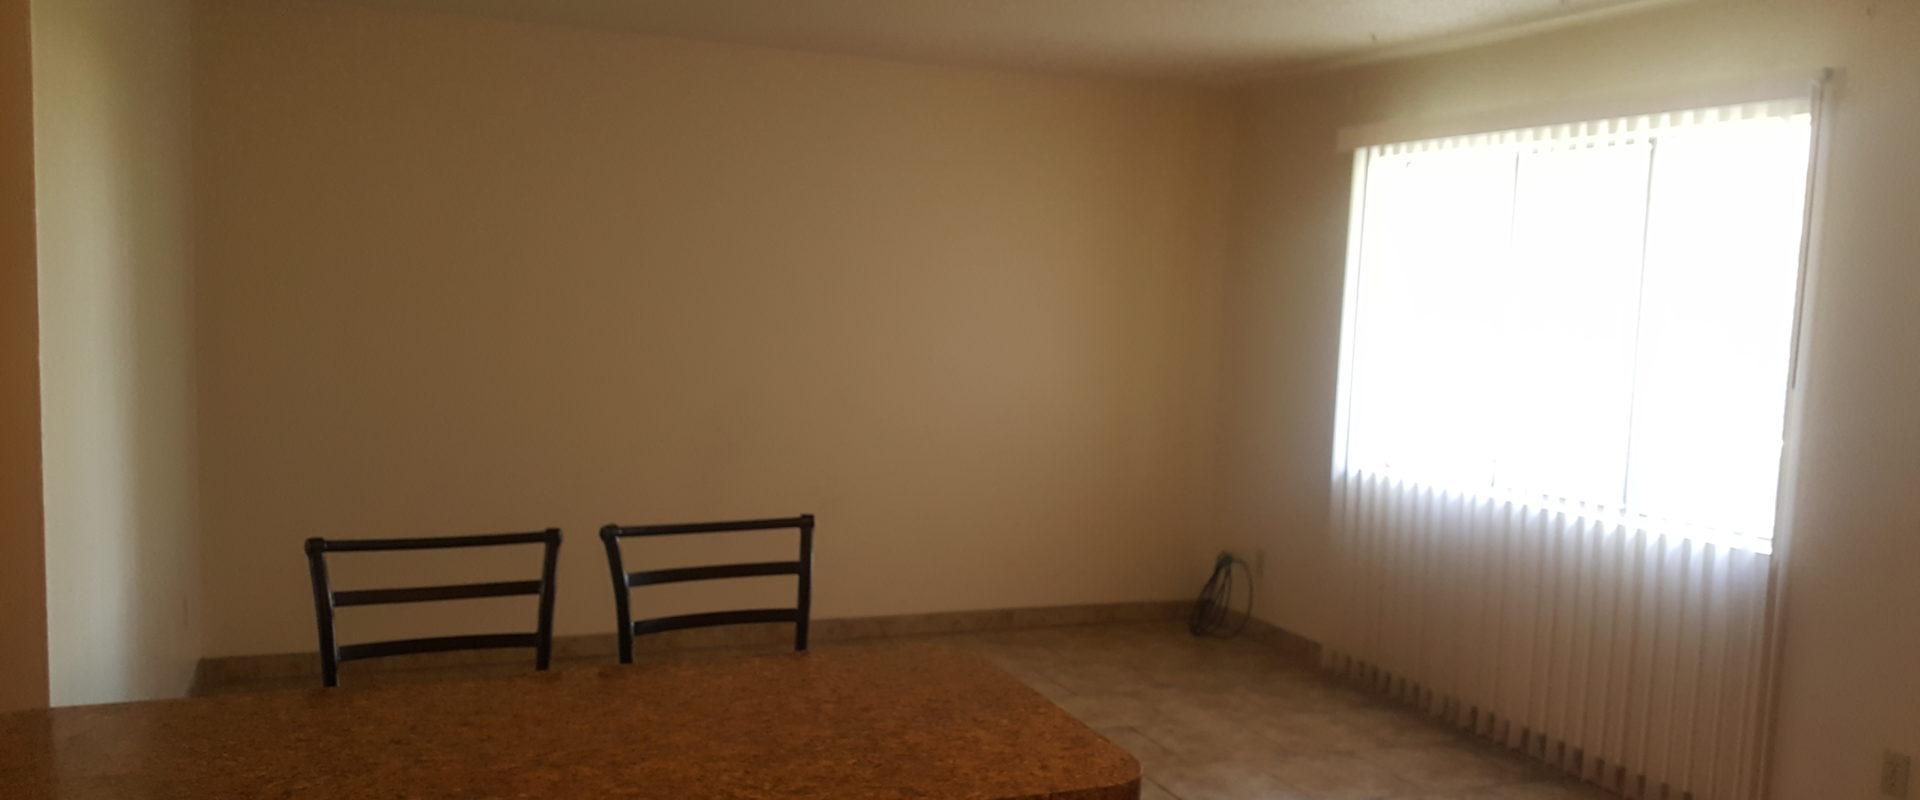 235 W. Madrid #9, Las Cruces, NM  88001